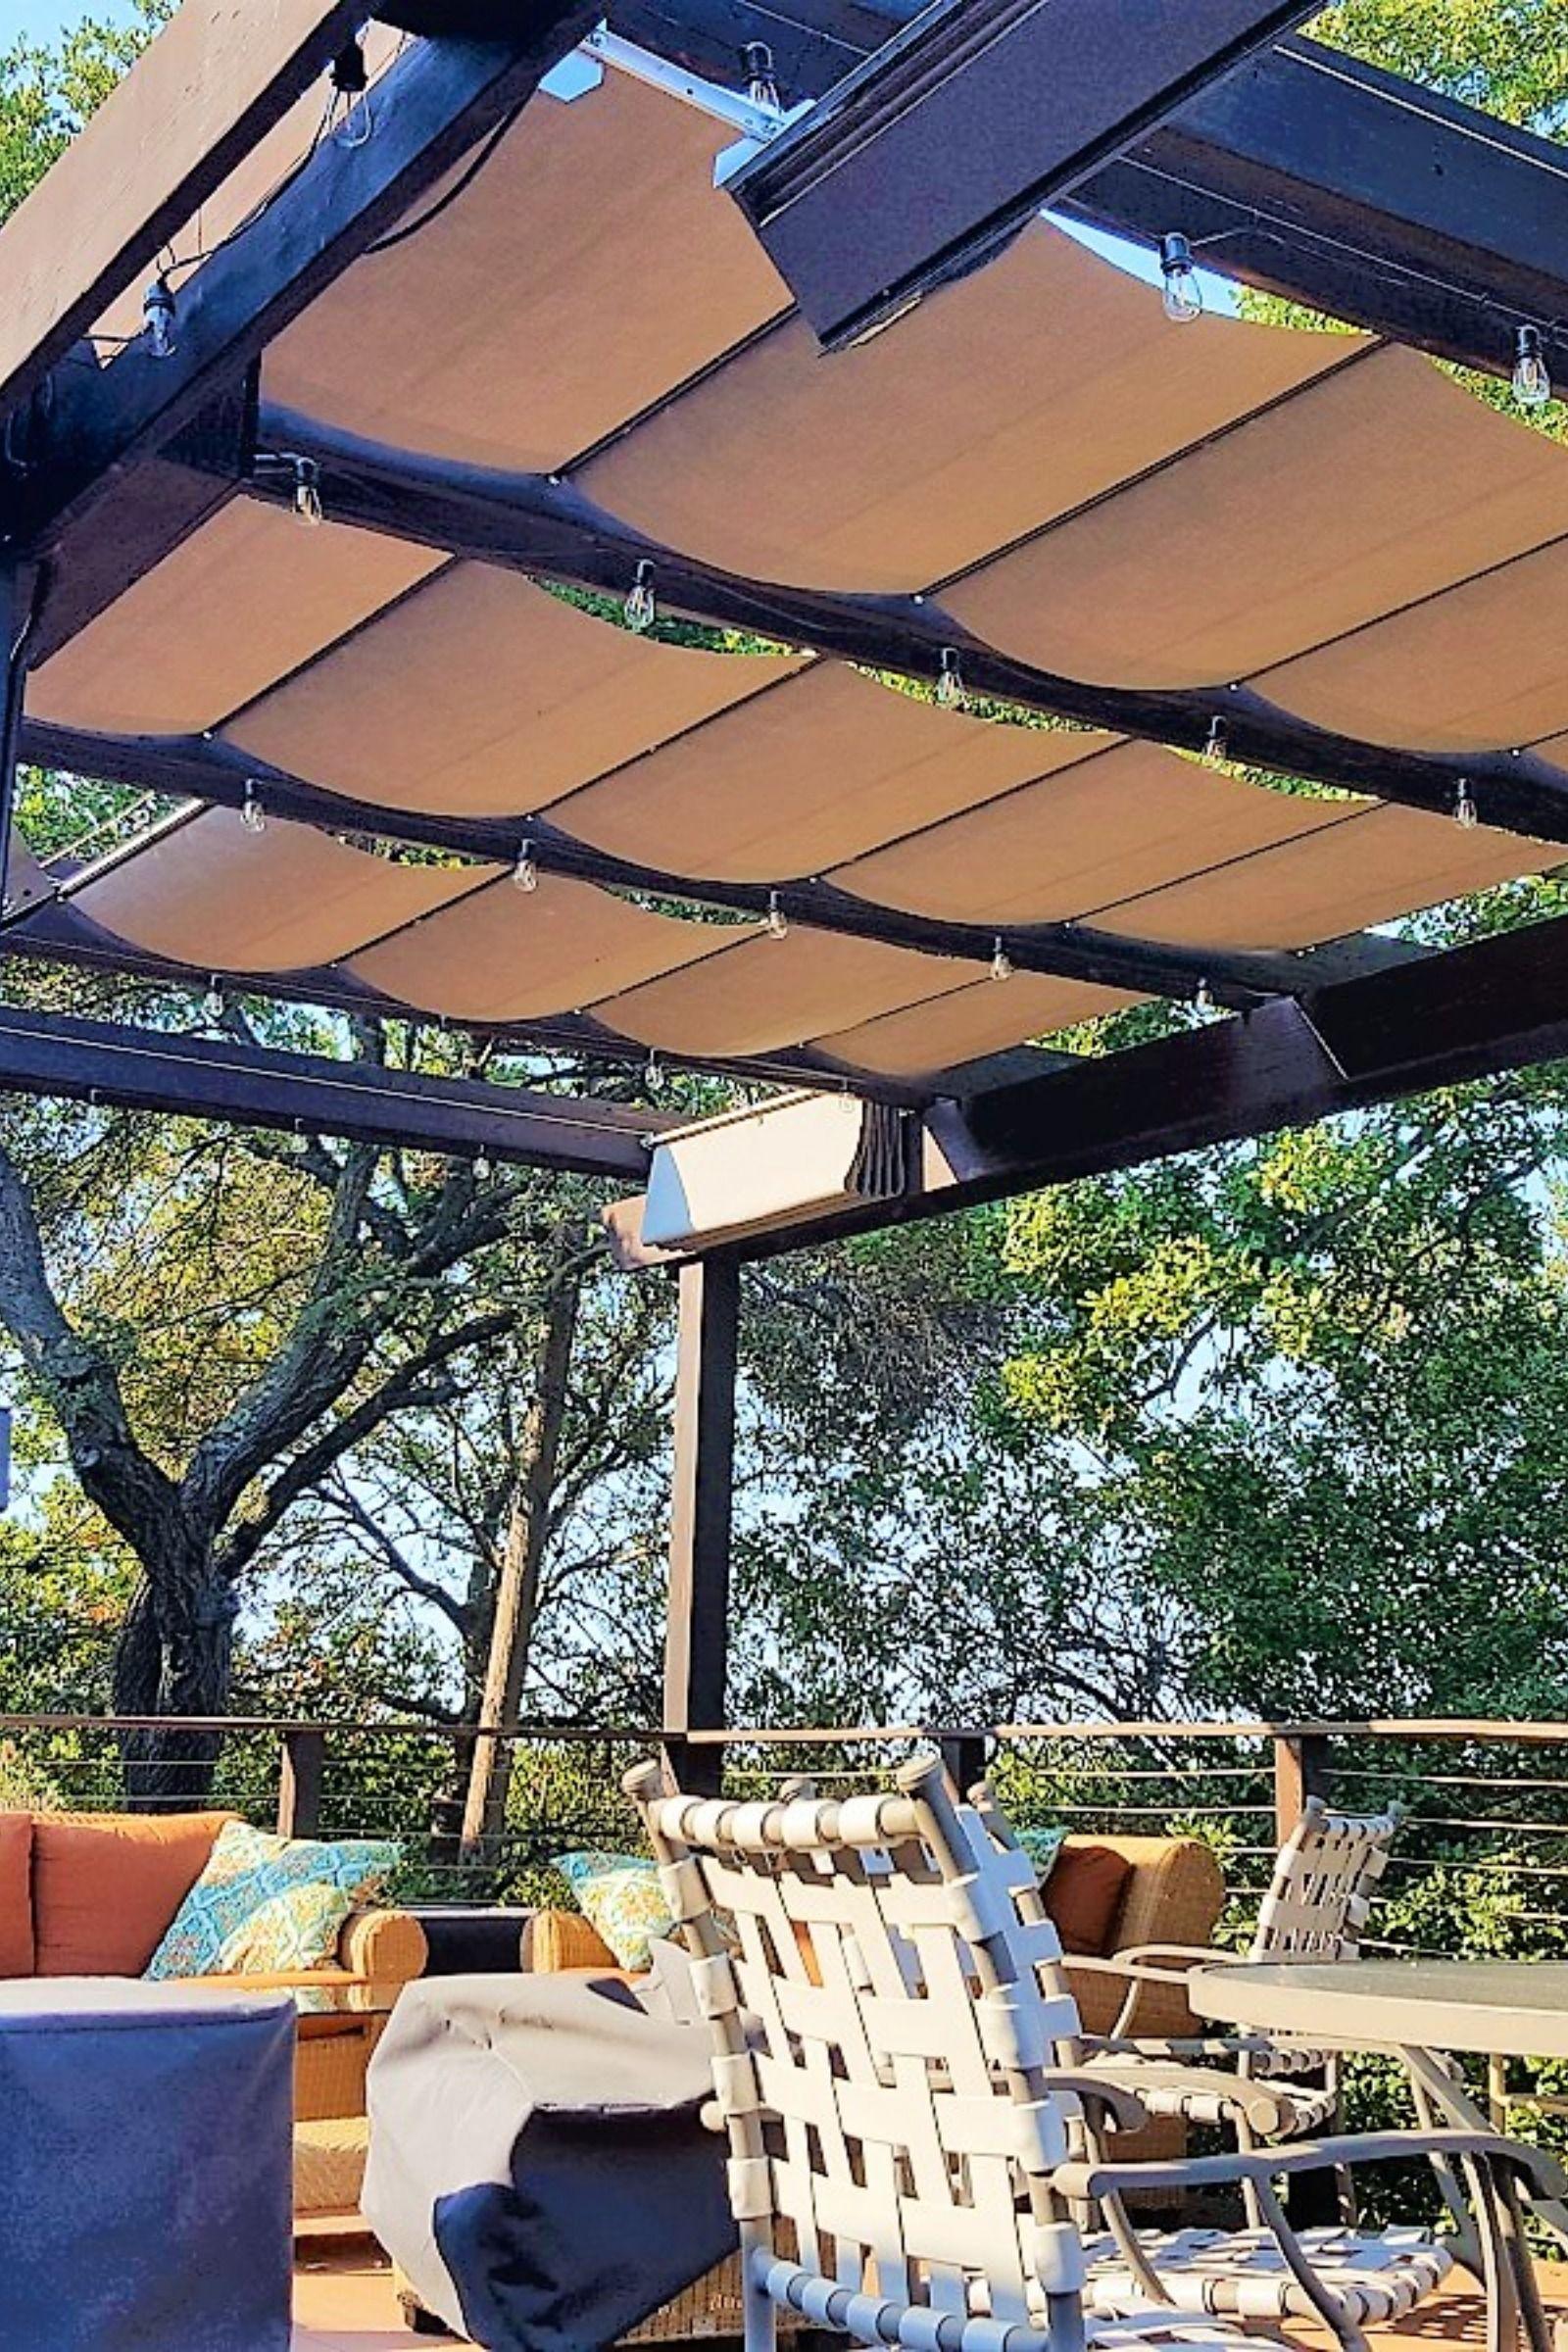 Backyard Pergola With New Tan Color Retractable Awnings Pergola Pergola Shade Cover Pergola Shade